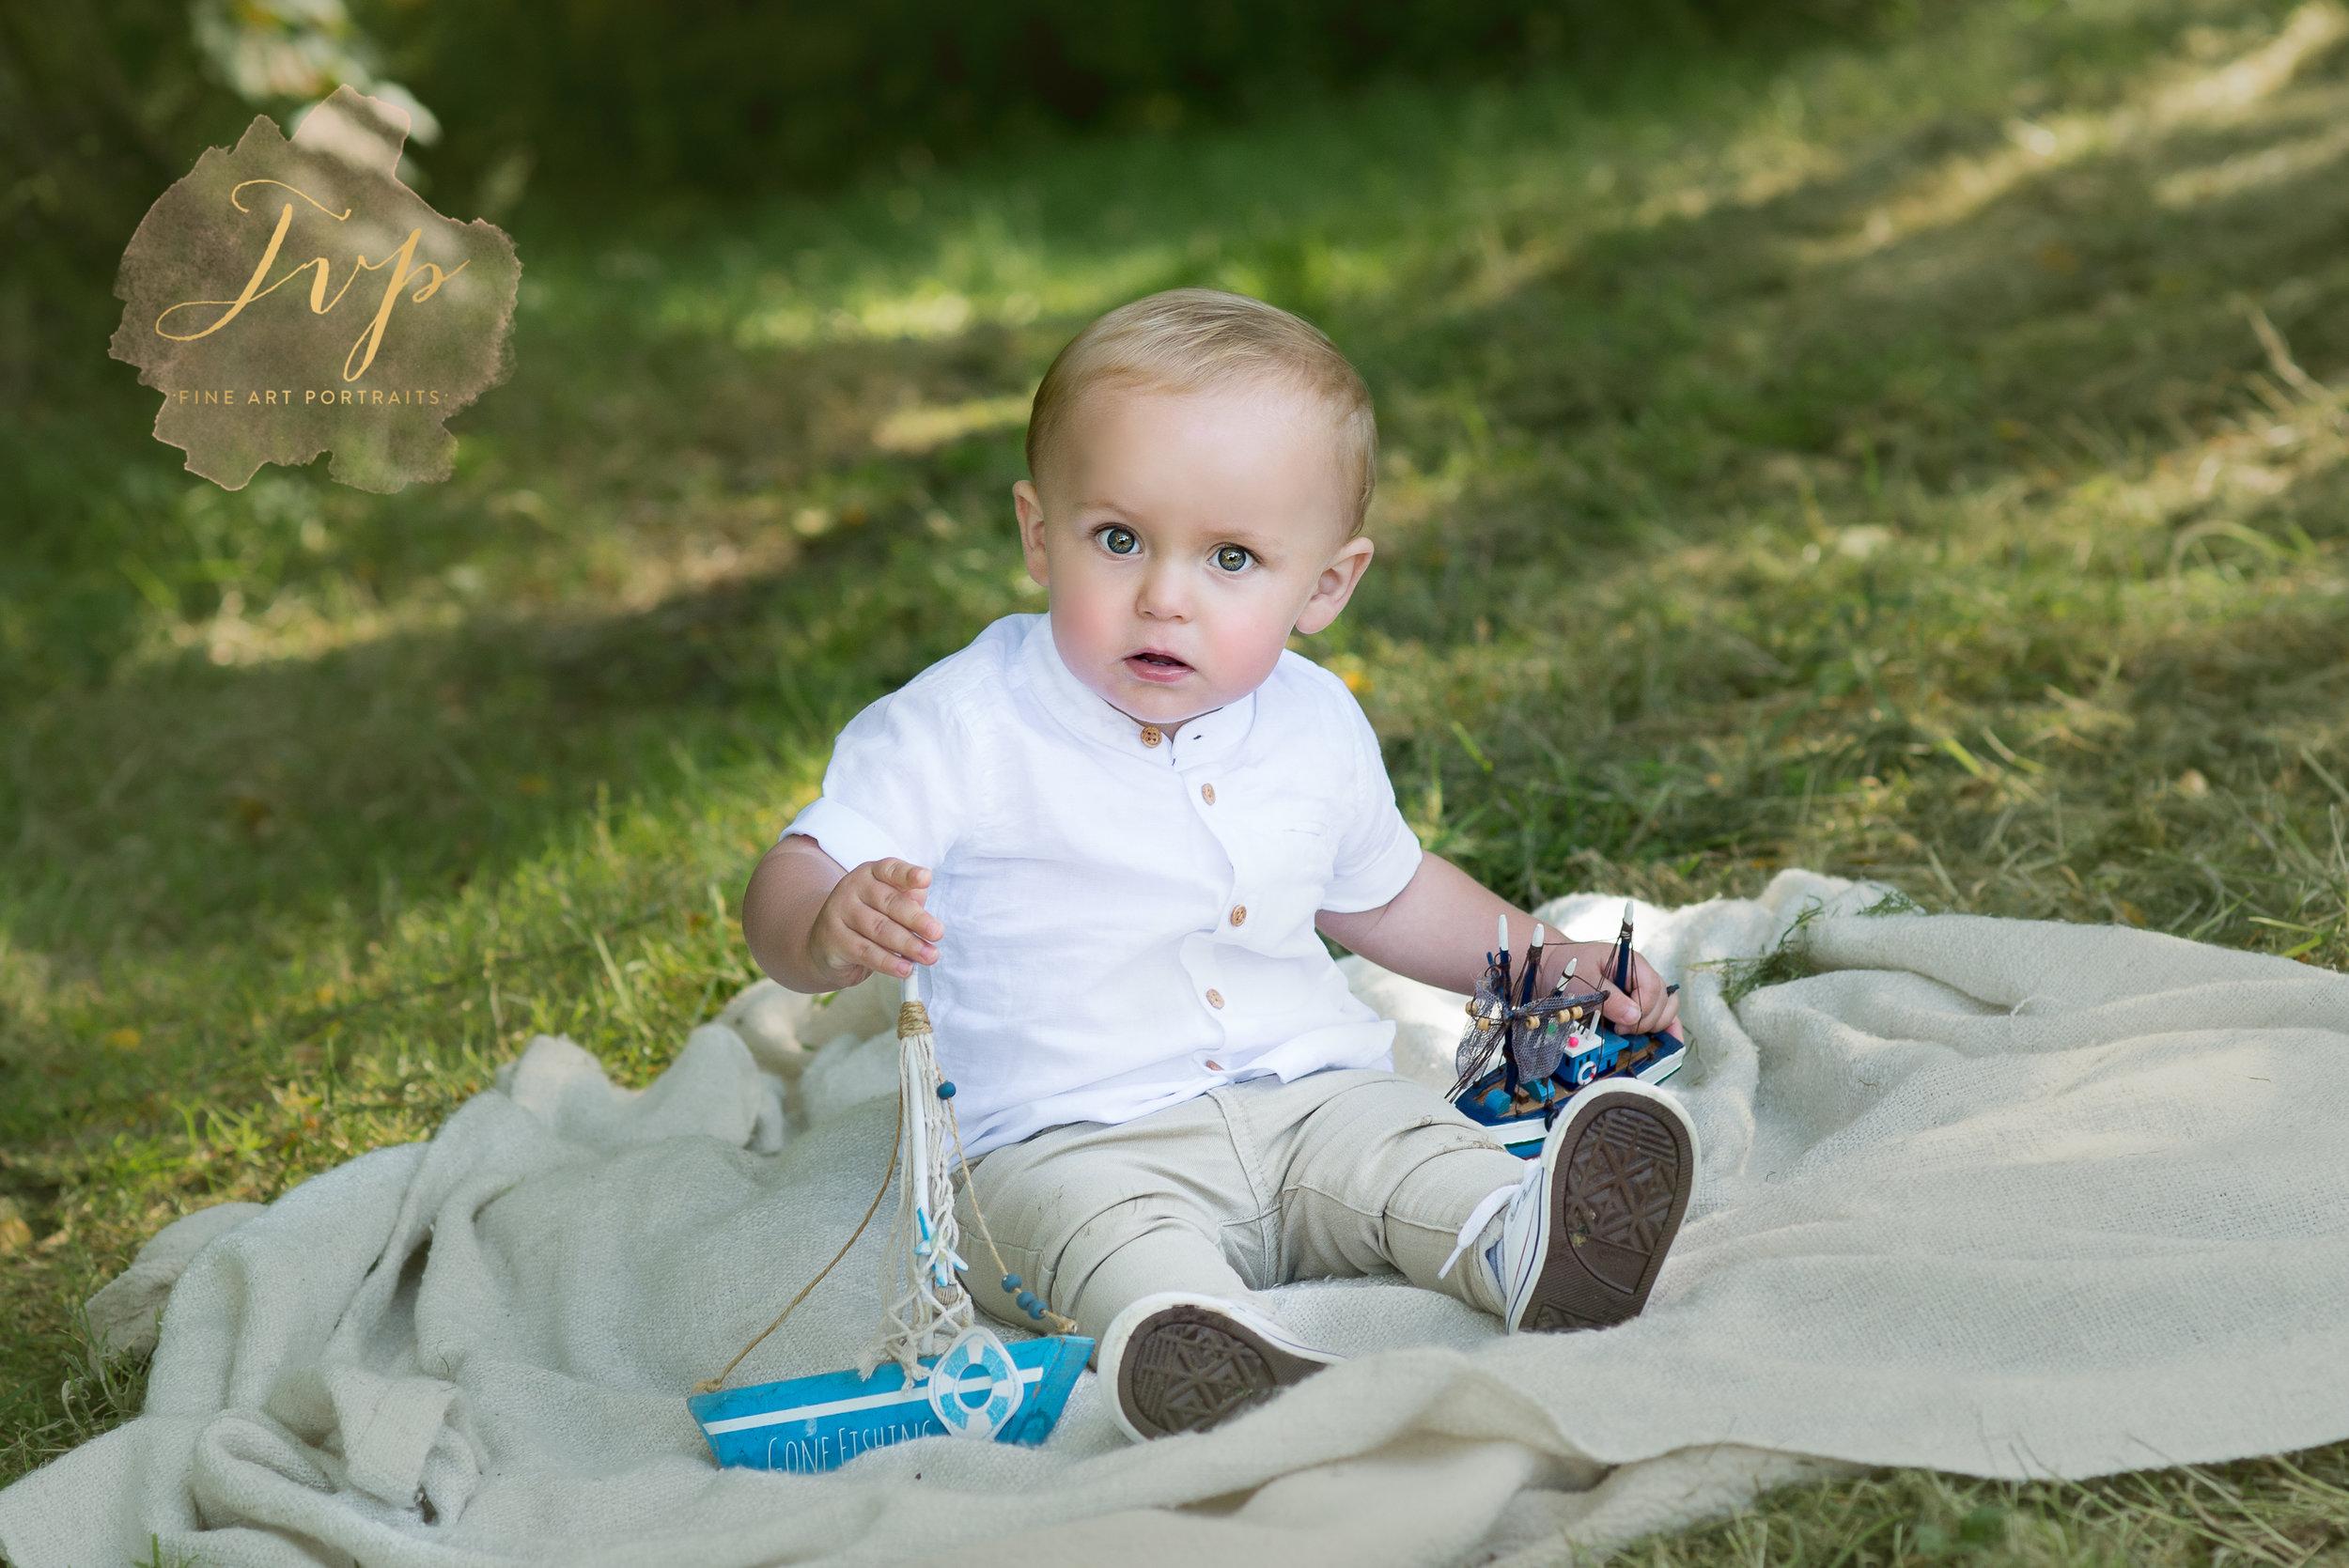 renfrewshire-photographer-baby-boy-with-boat